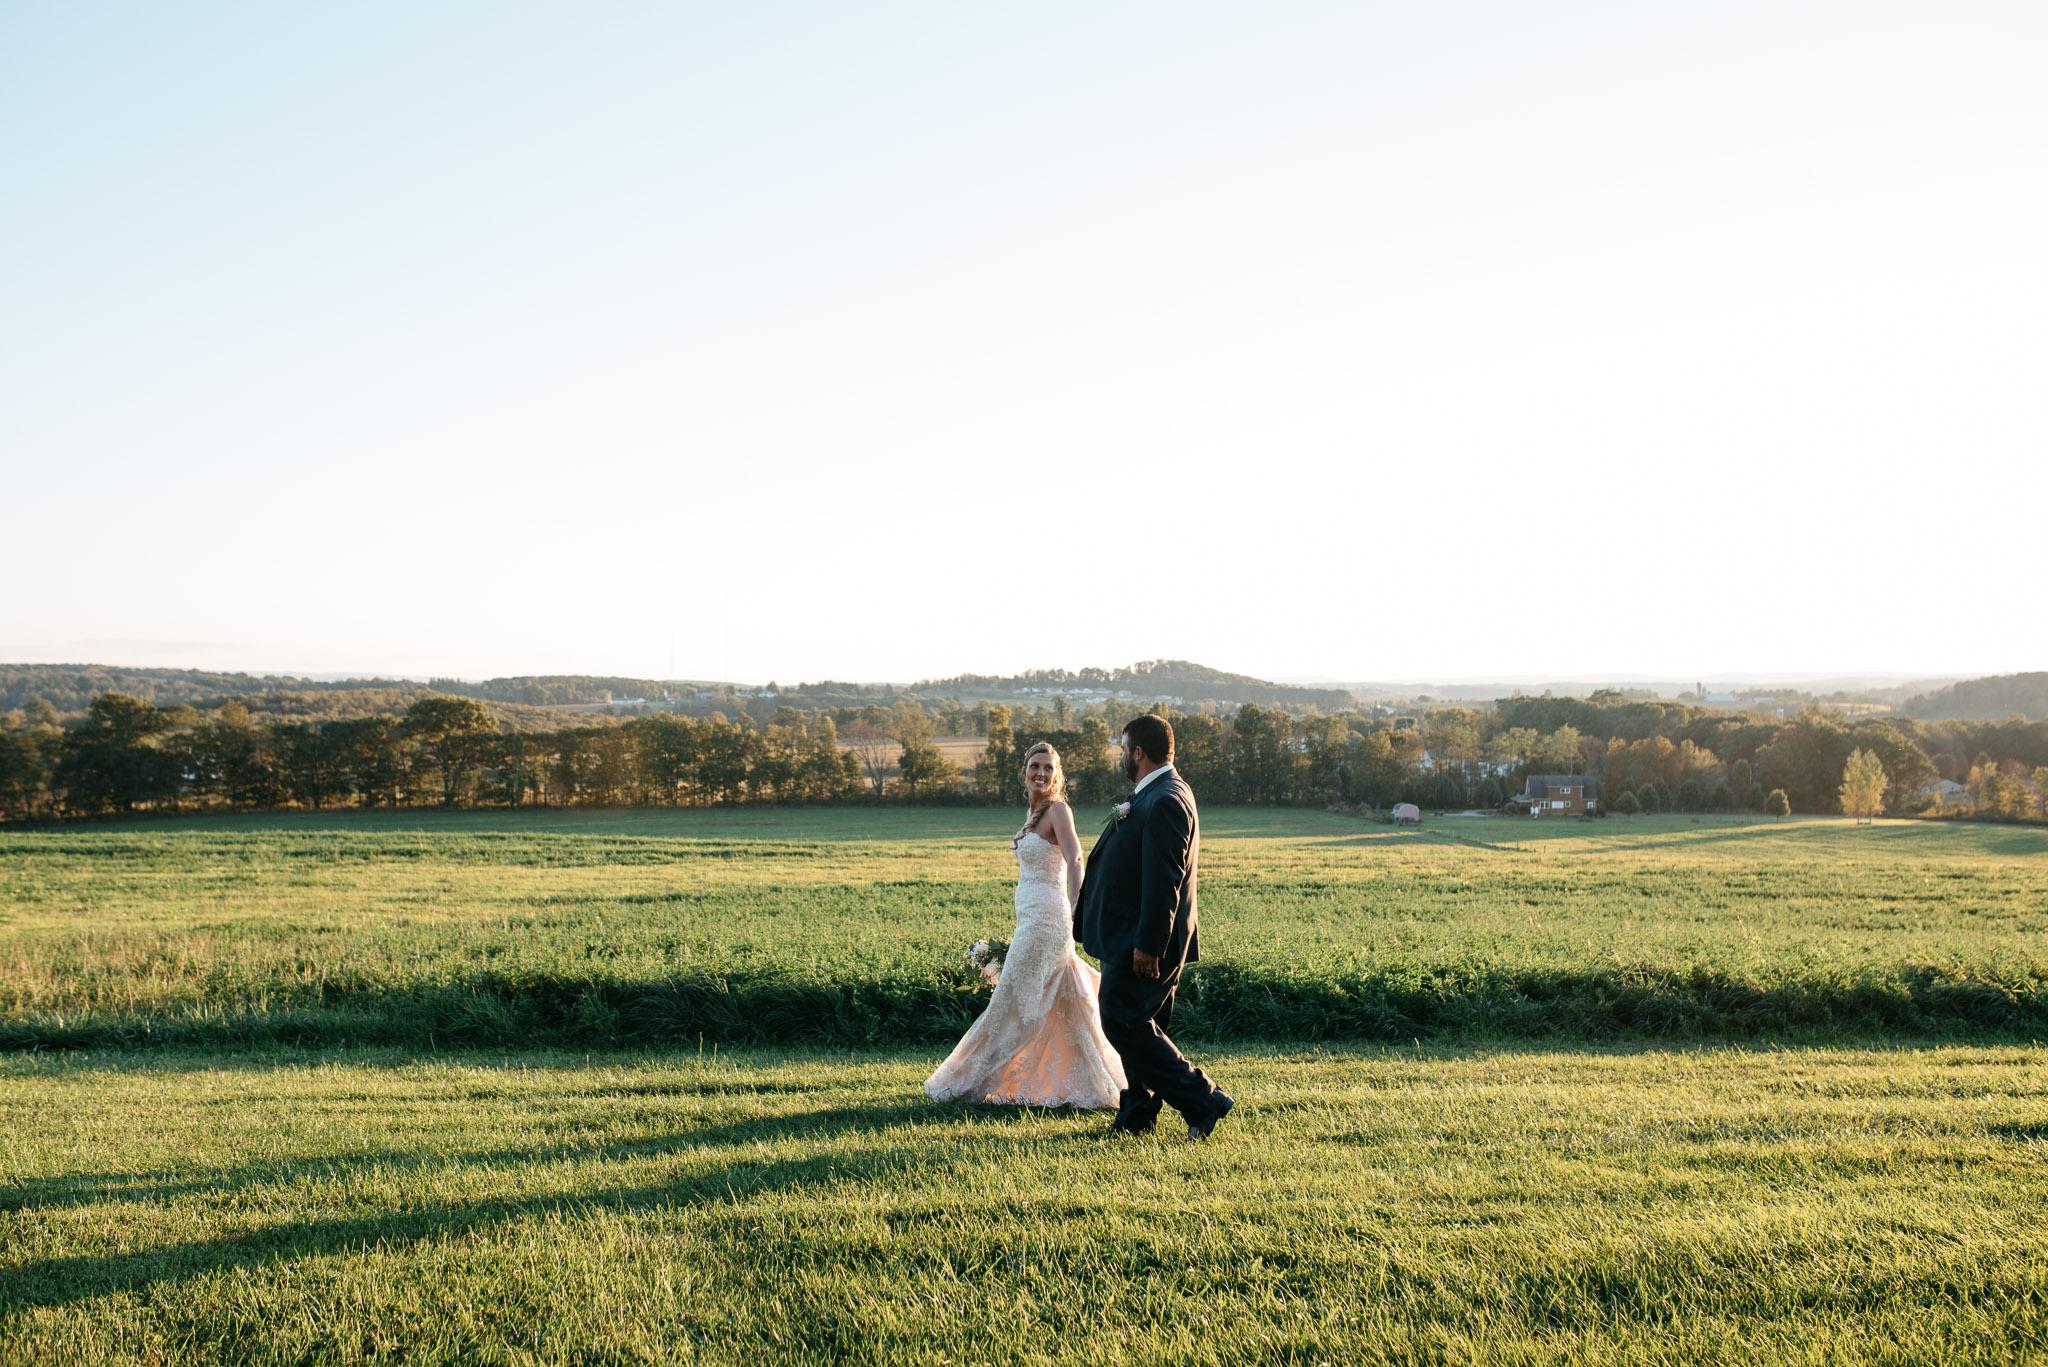 pittsburgh-ligonier-wedding-photographer-the-event-barn-at-highland-farms-50.jpg